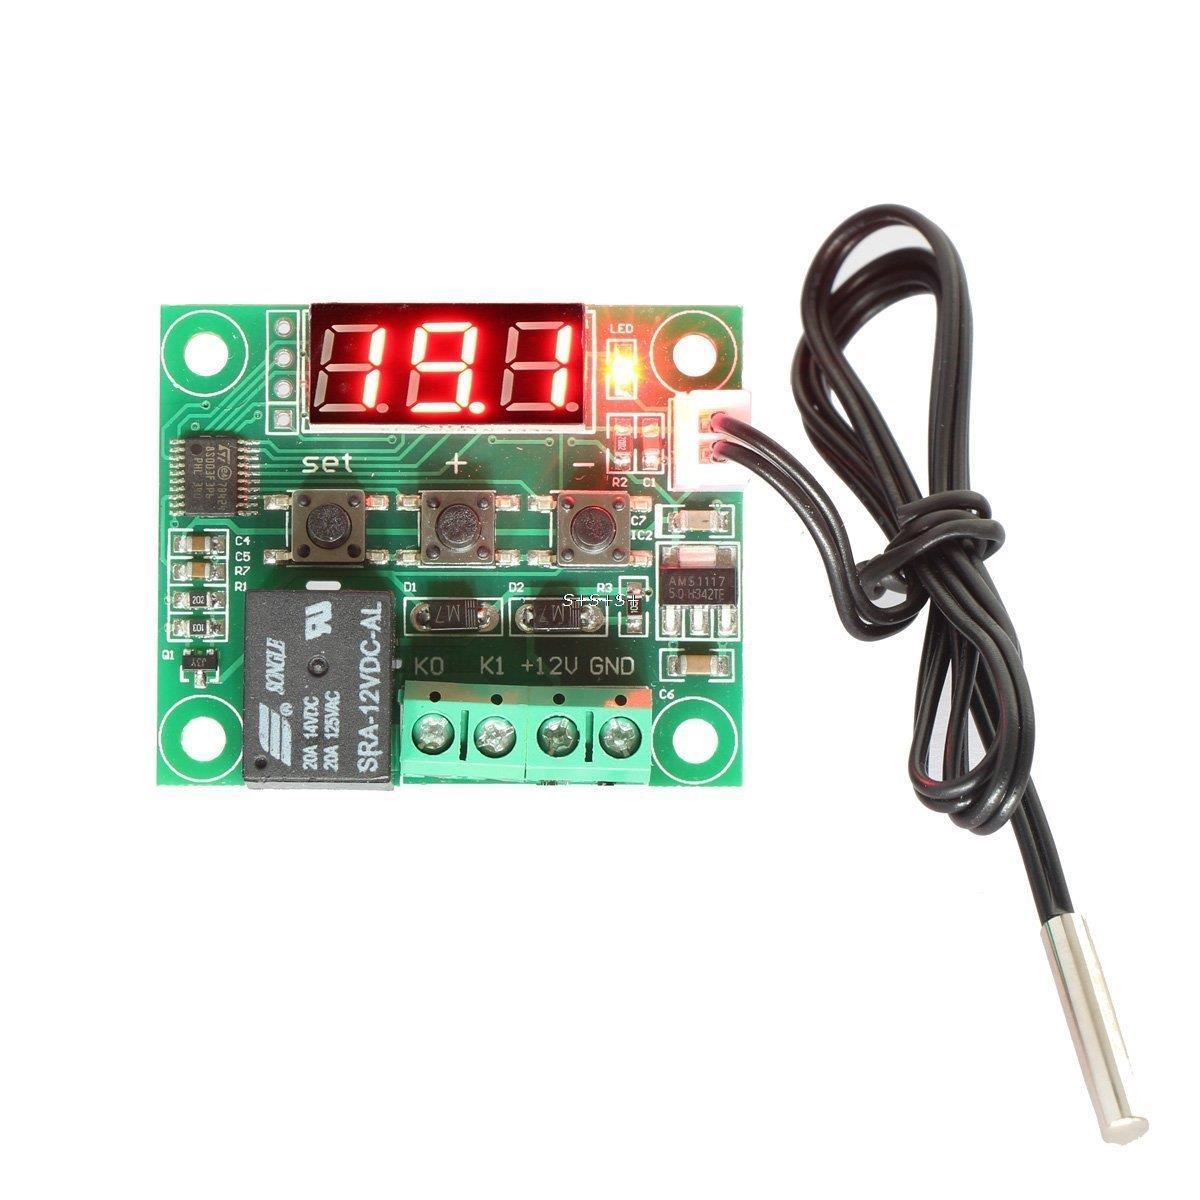 Hot 50-110° 12V W1209 Digital thermostat Temperature Control Switch Sensor+Case